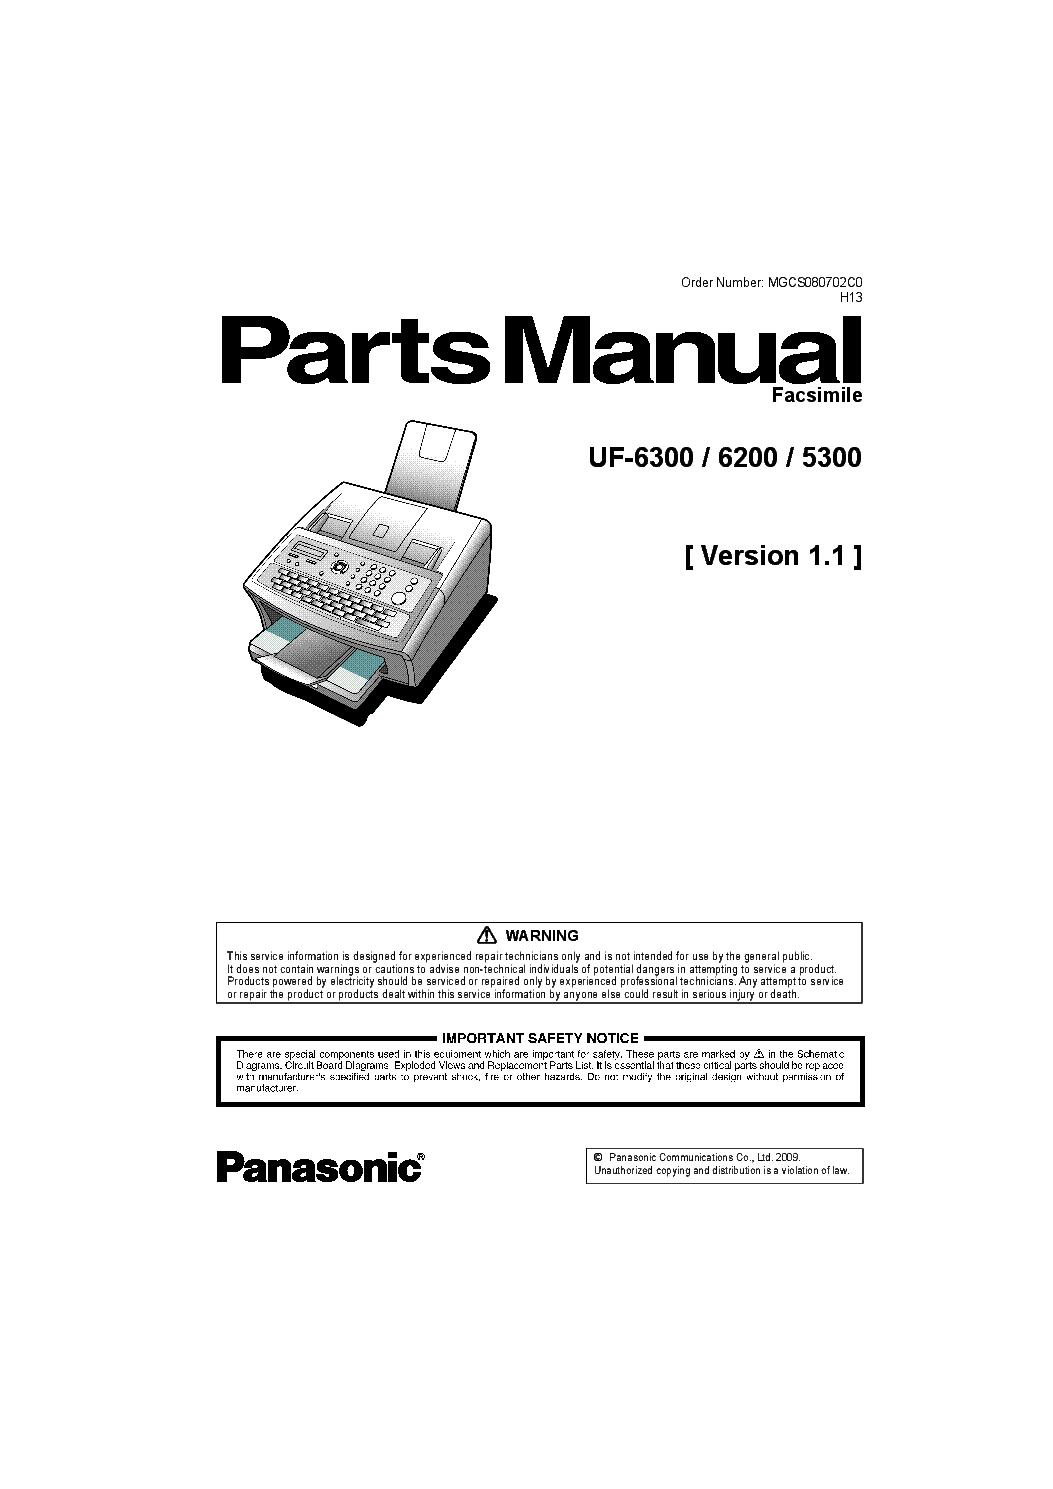 Service manual panasonic uf-5300, uf-6200, uf-6300 ― manual-shop. Ru.